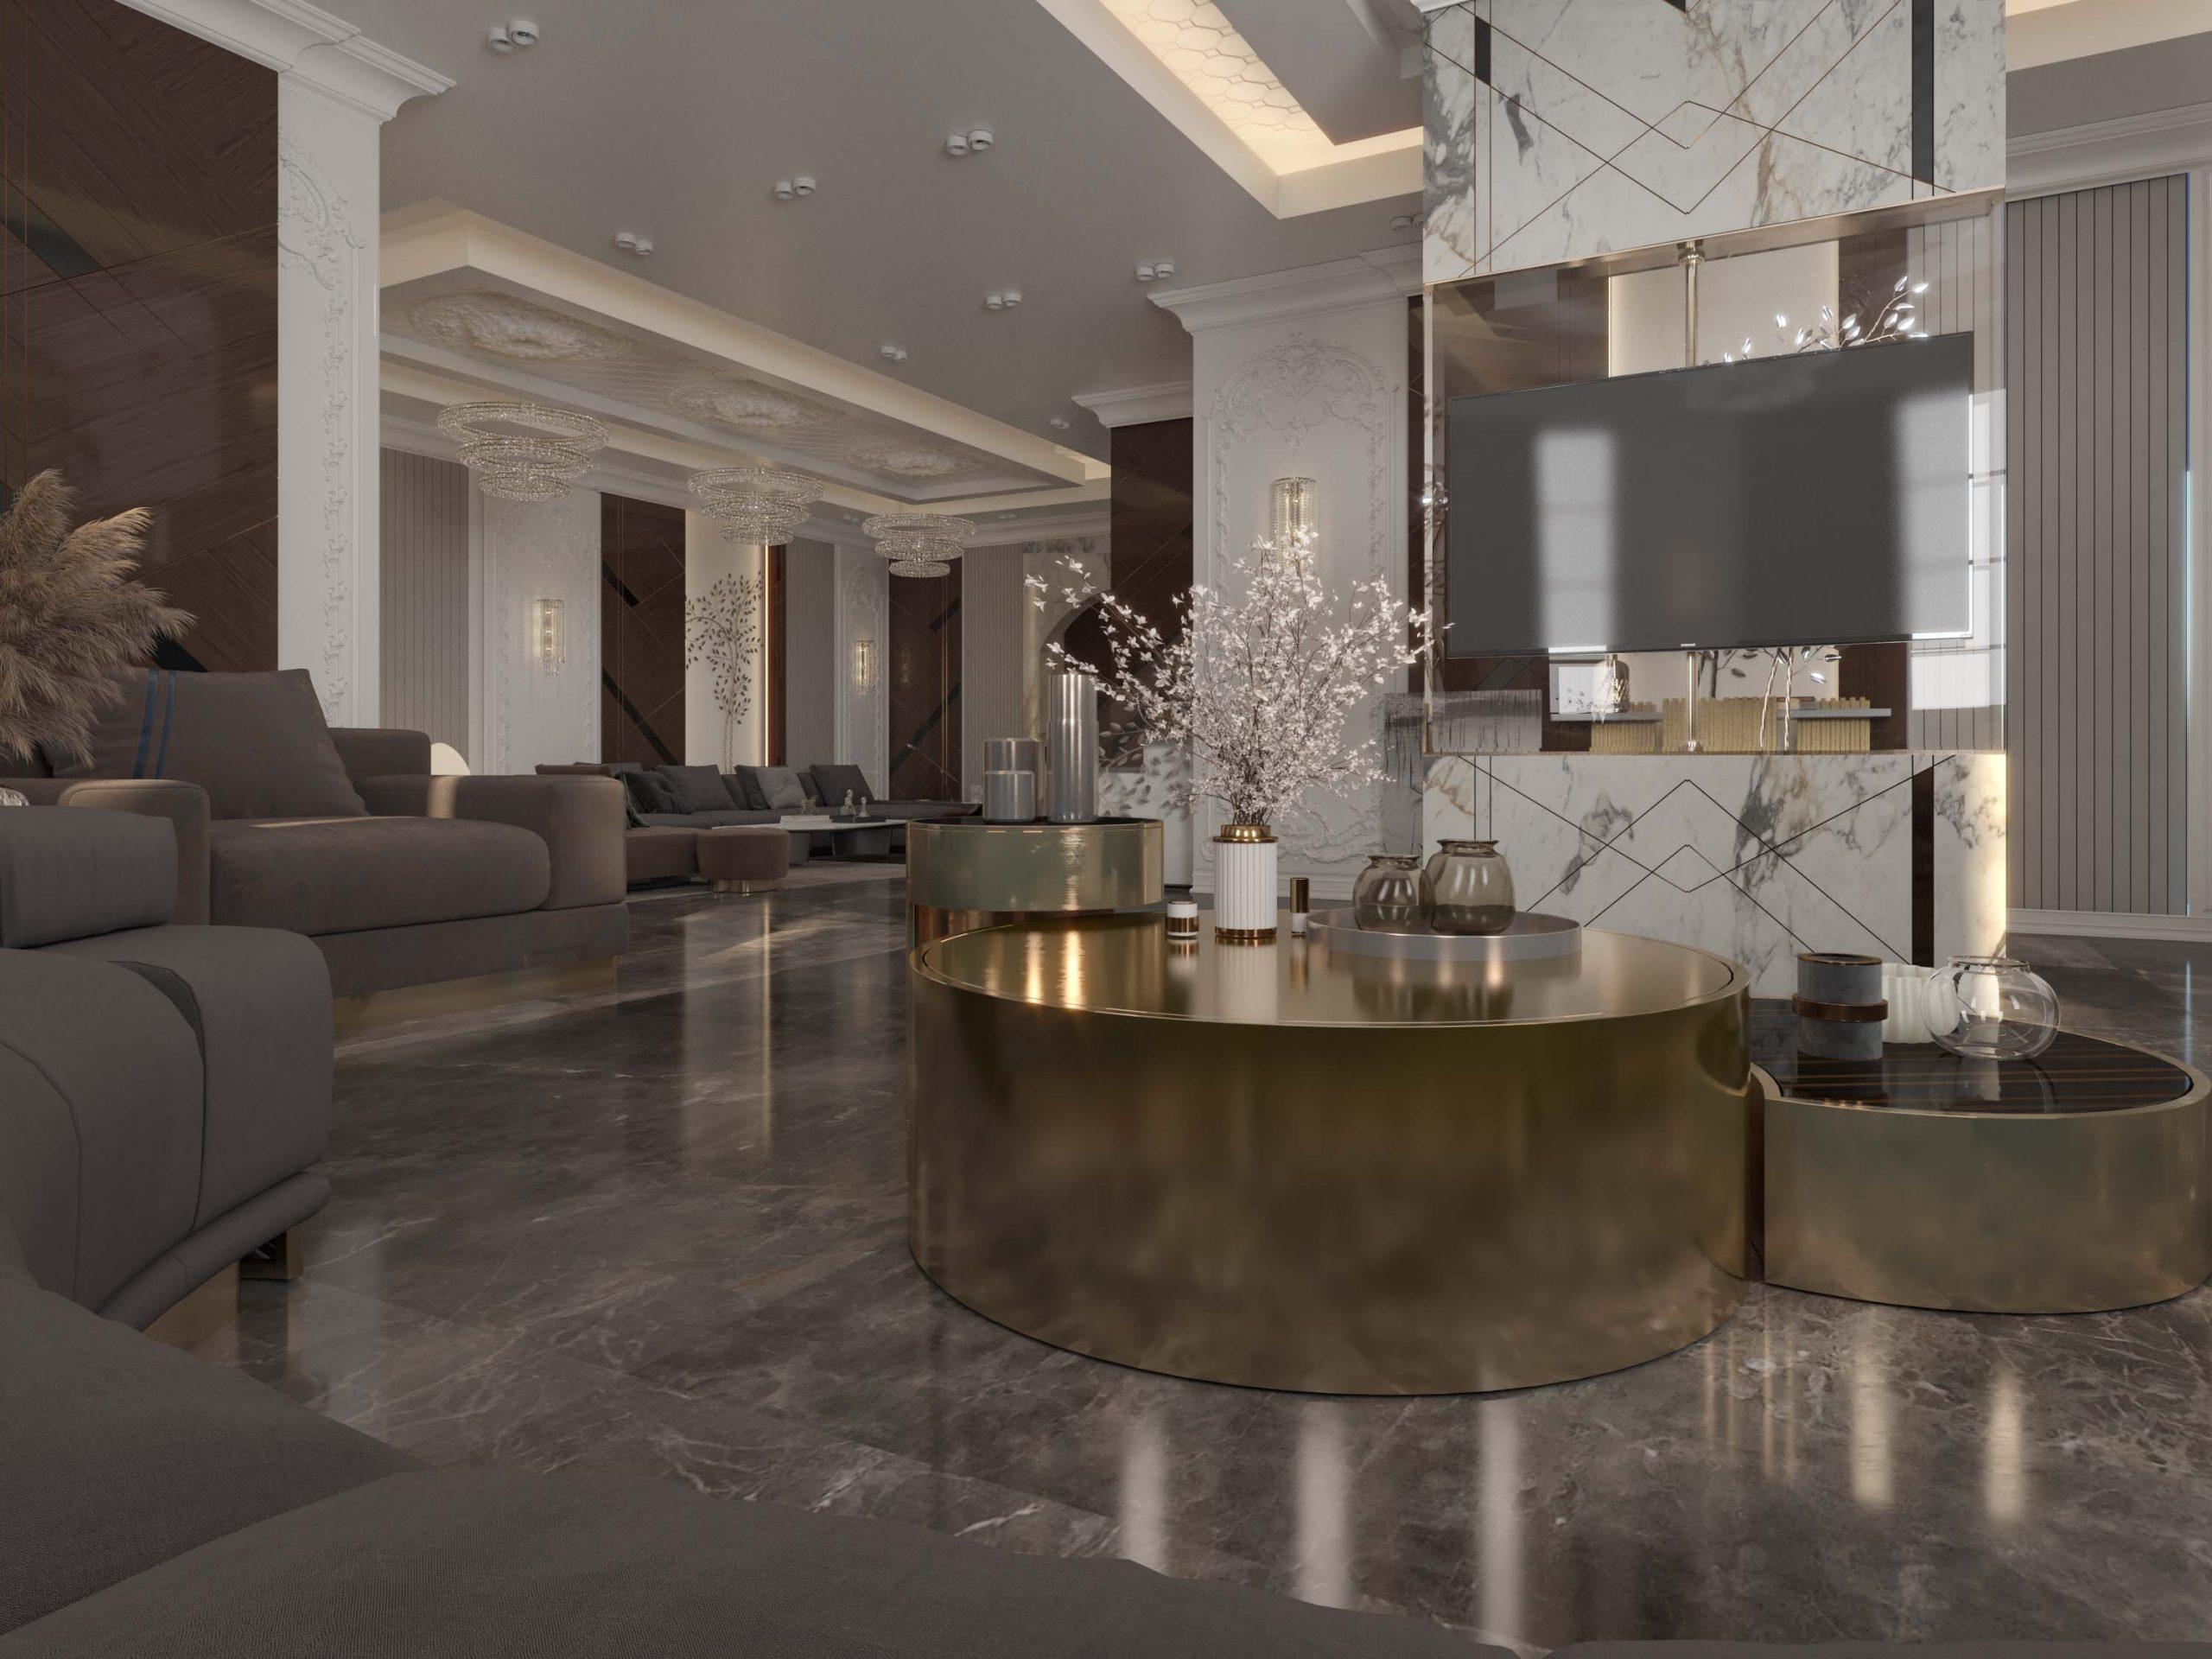 modern - classic - well designed sala - golden tables